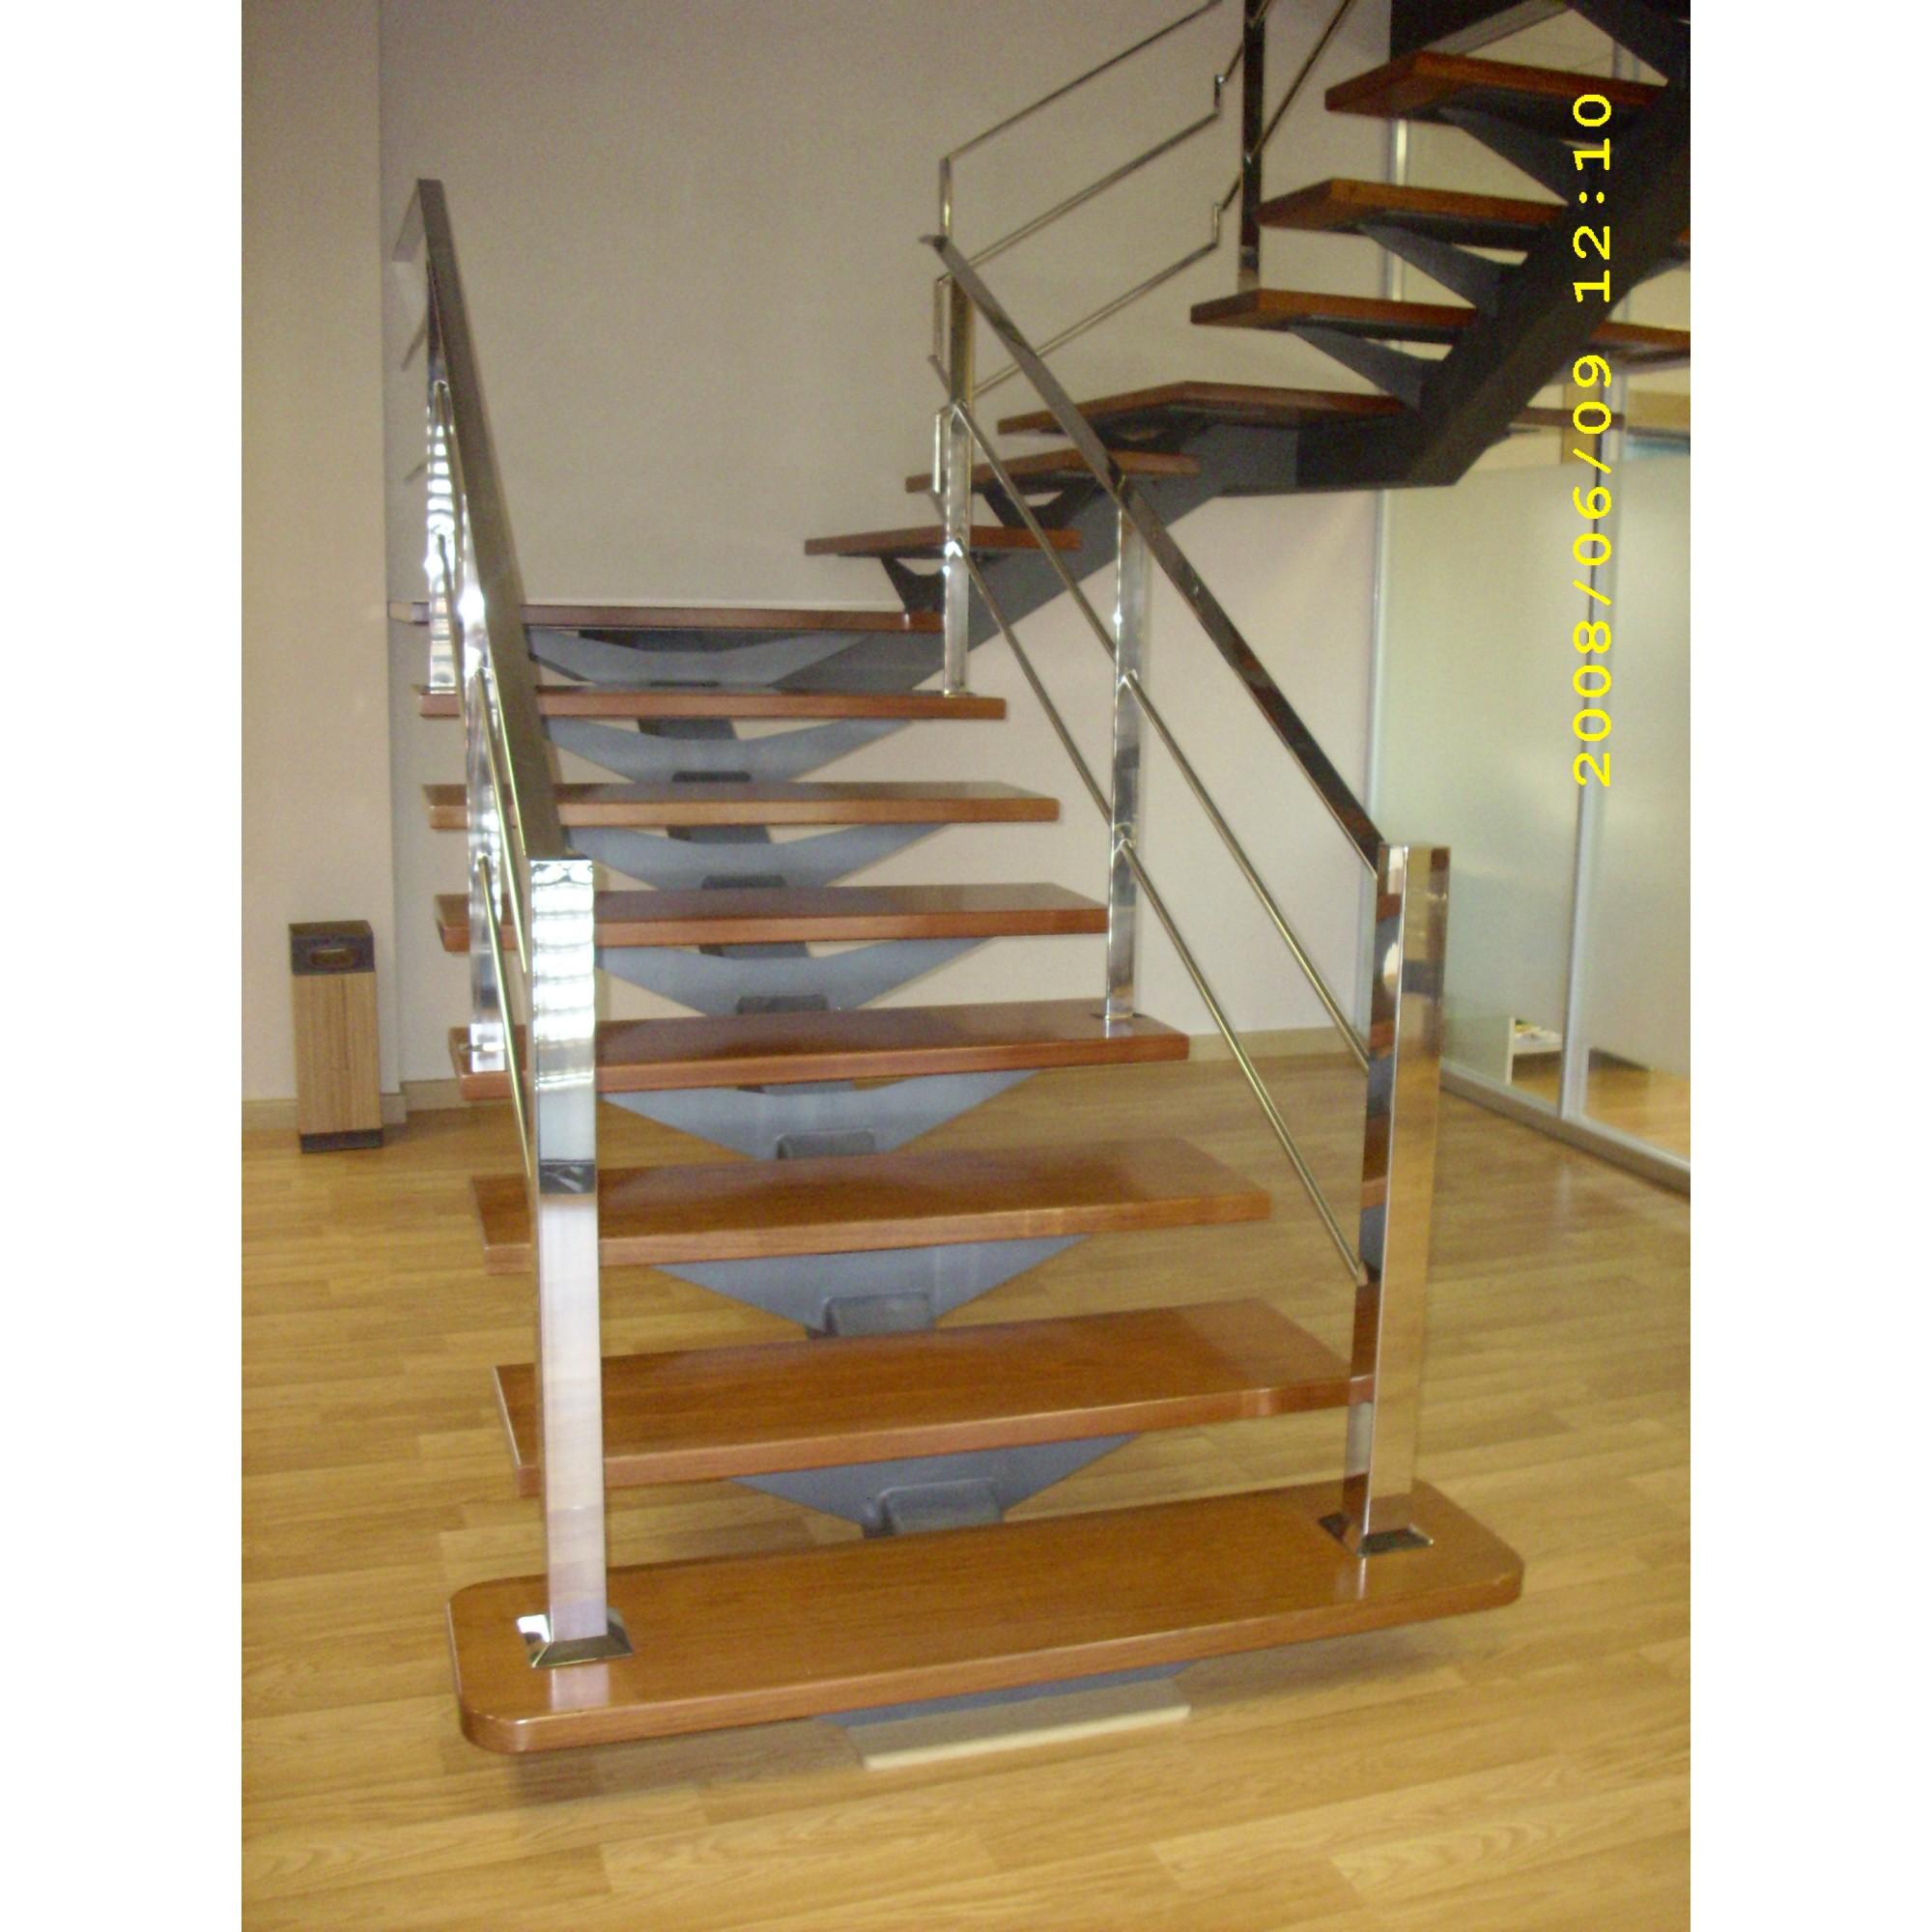 Escalera a medida de interior combinada - Barandilla escalera interior ...